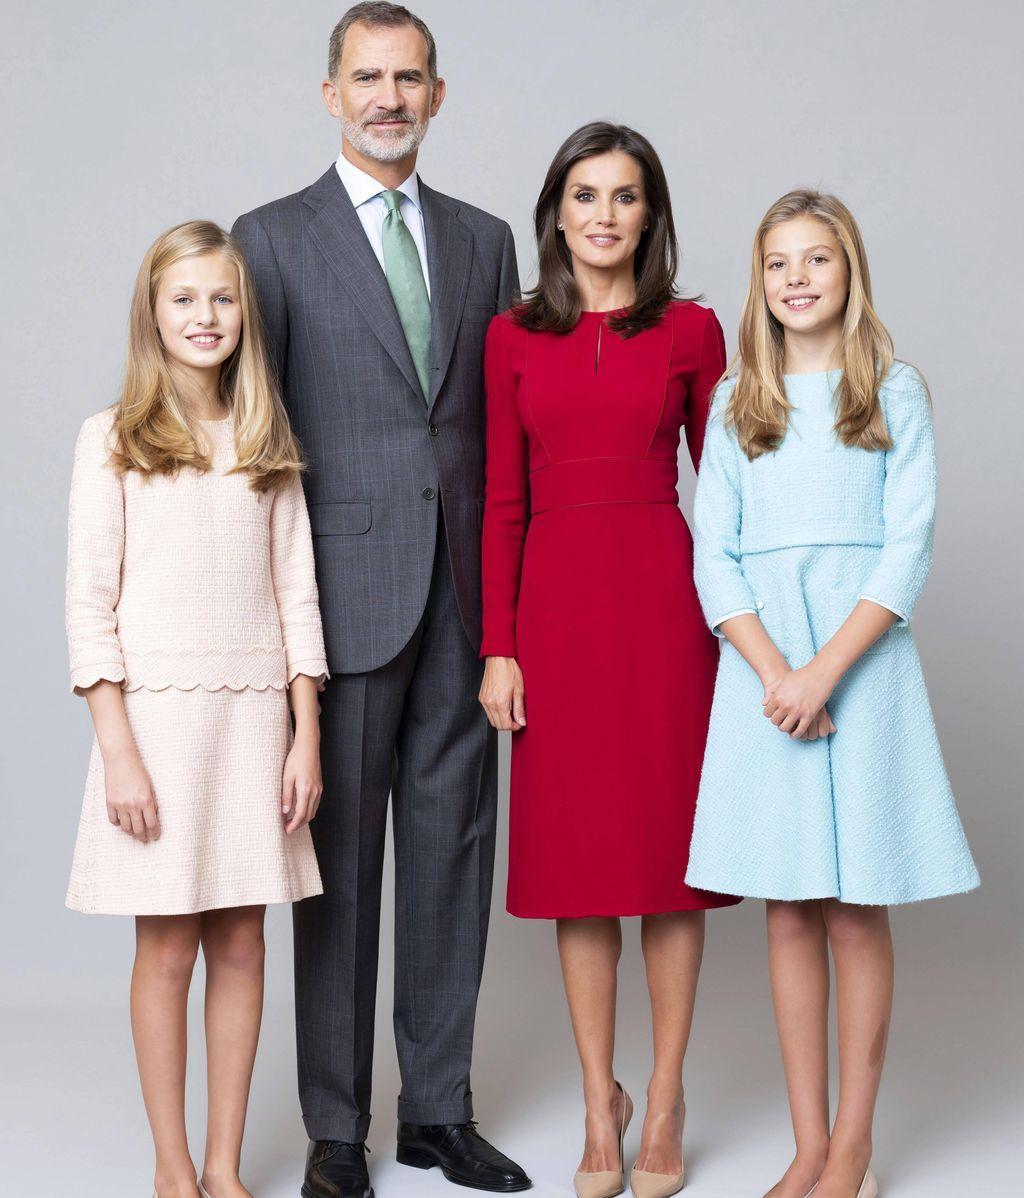 Foto oficial de la familia real